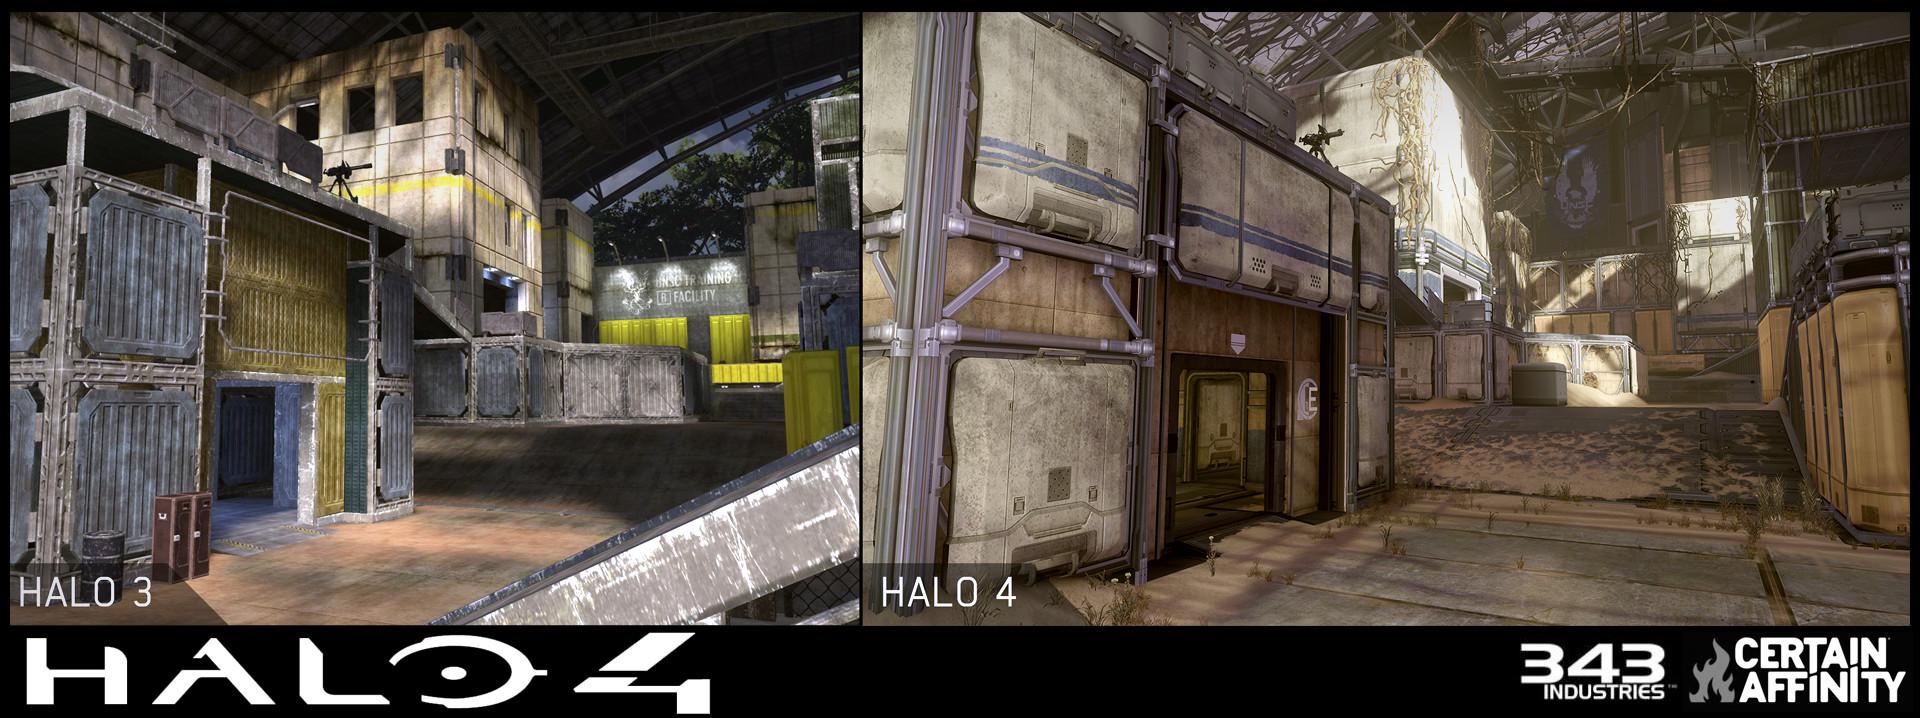 Jason Bretz - Halo 4 DLC Pitfall Multiplayer Map